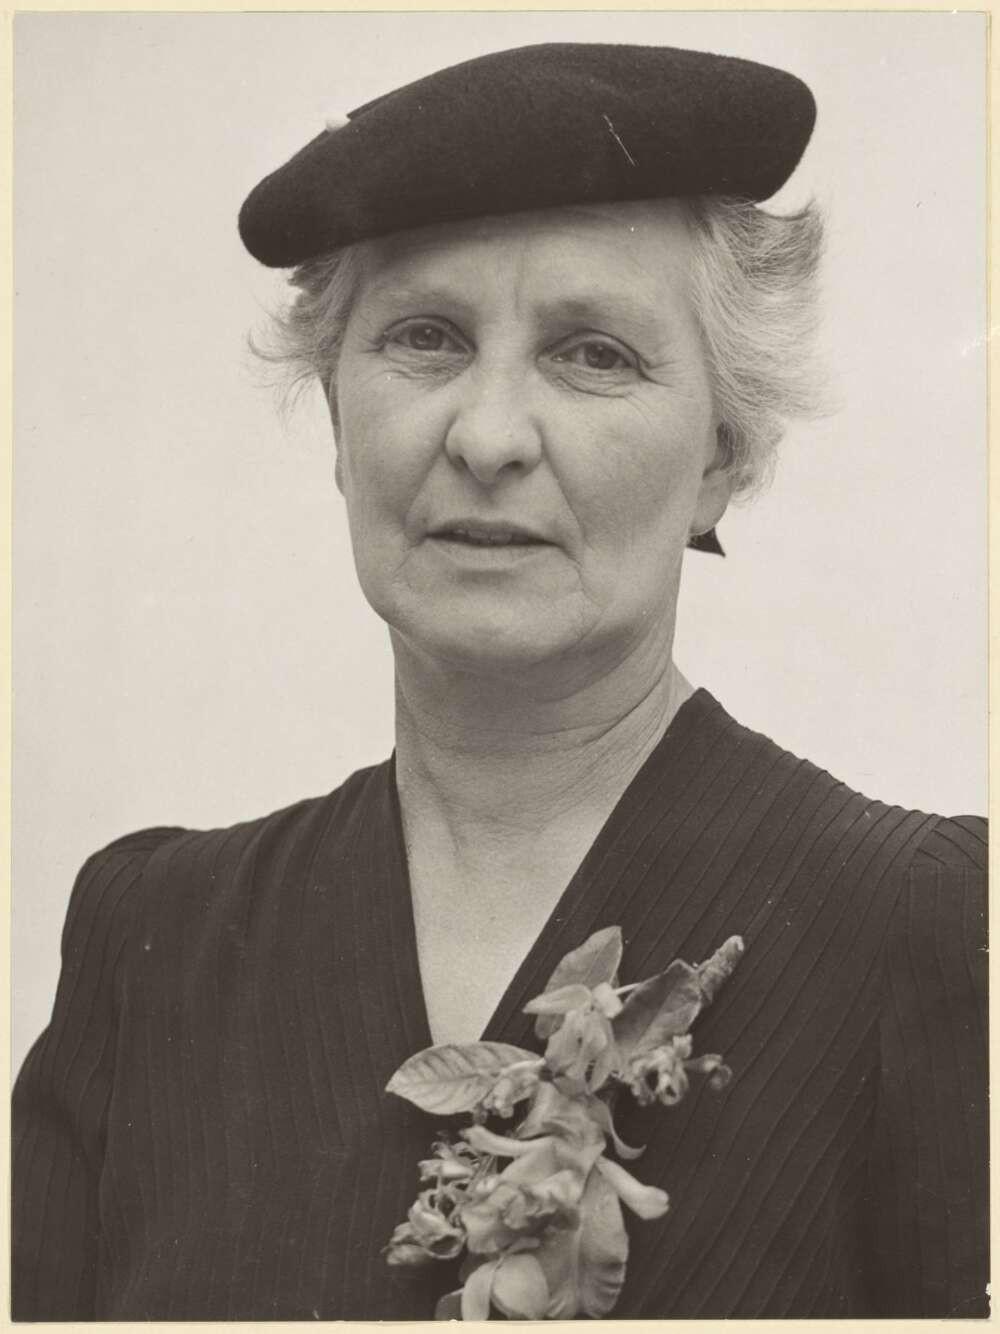 Doris Blackburn, circa 1940s. Source: Trove, National Library of Australia.